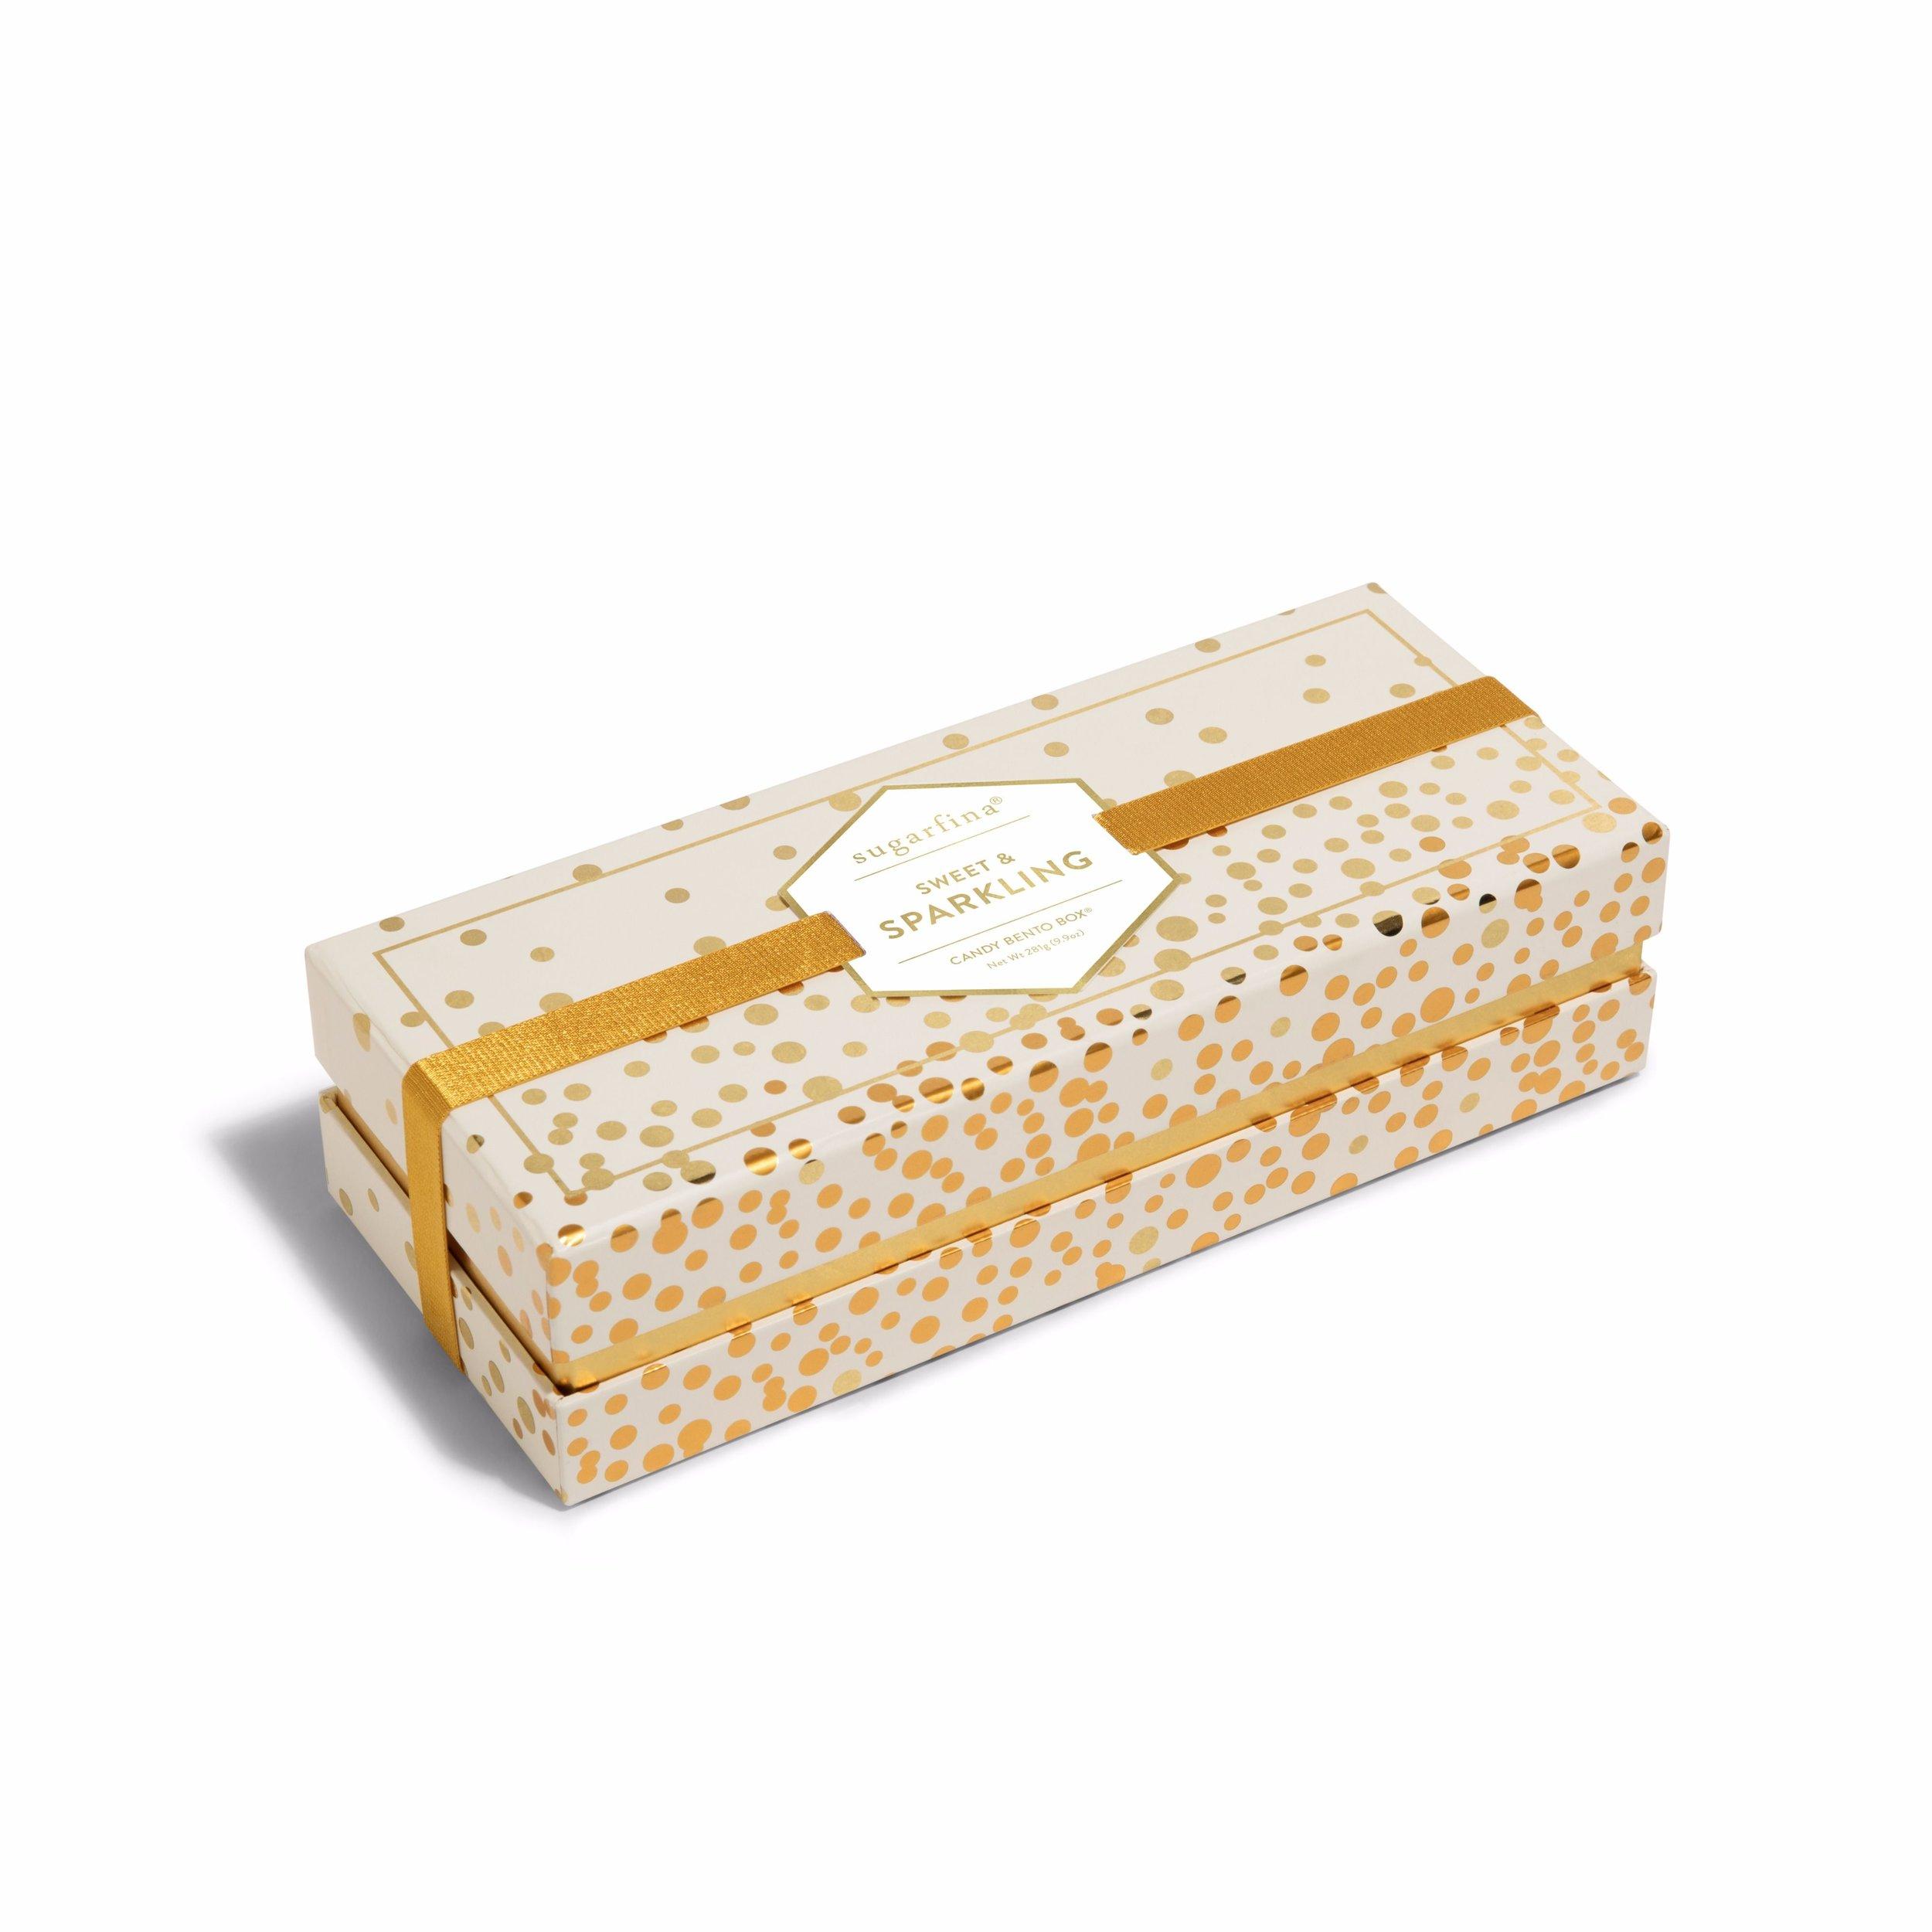 Sugarfina - Sweet & Sparkling 3pc Bento Box